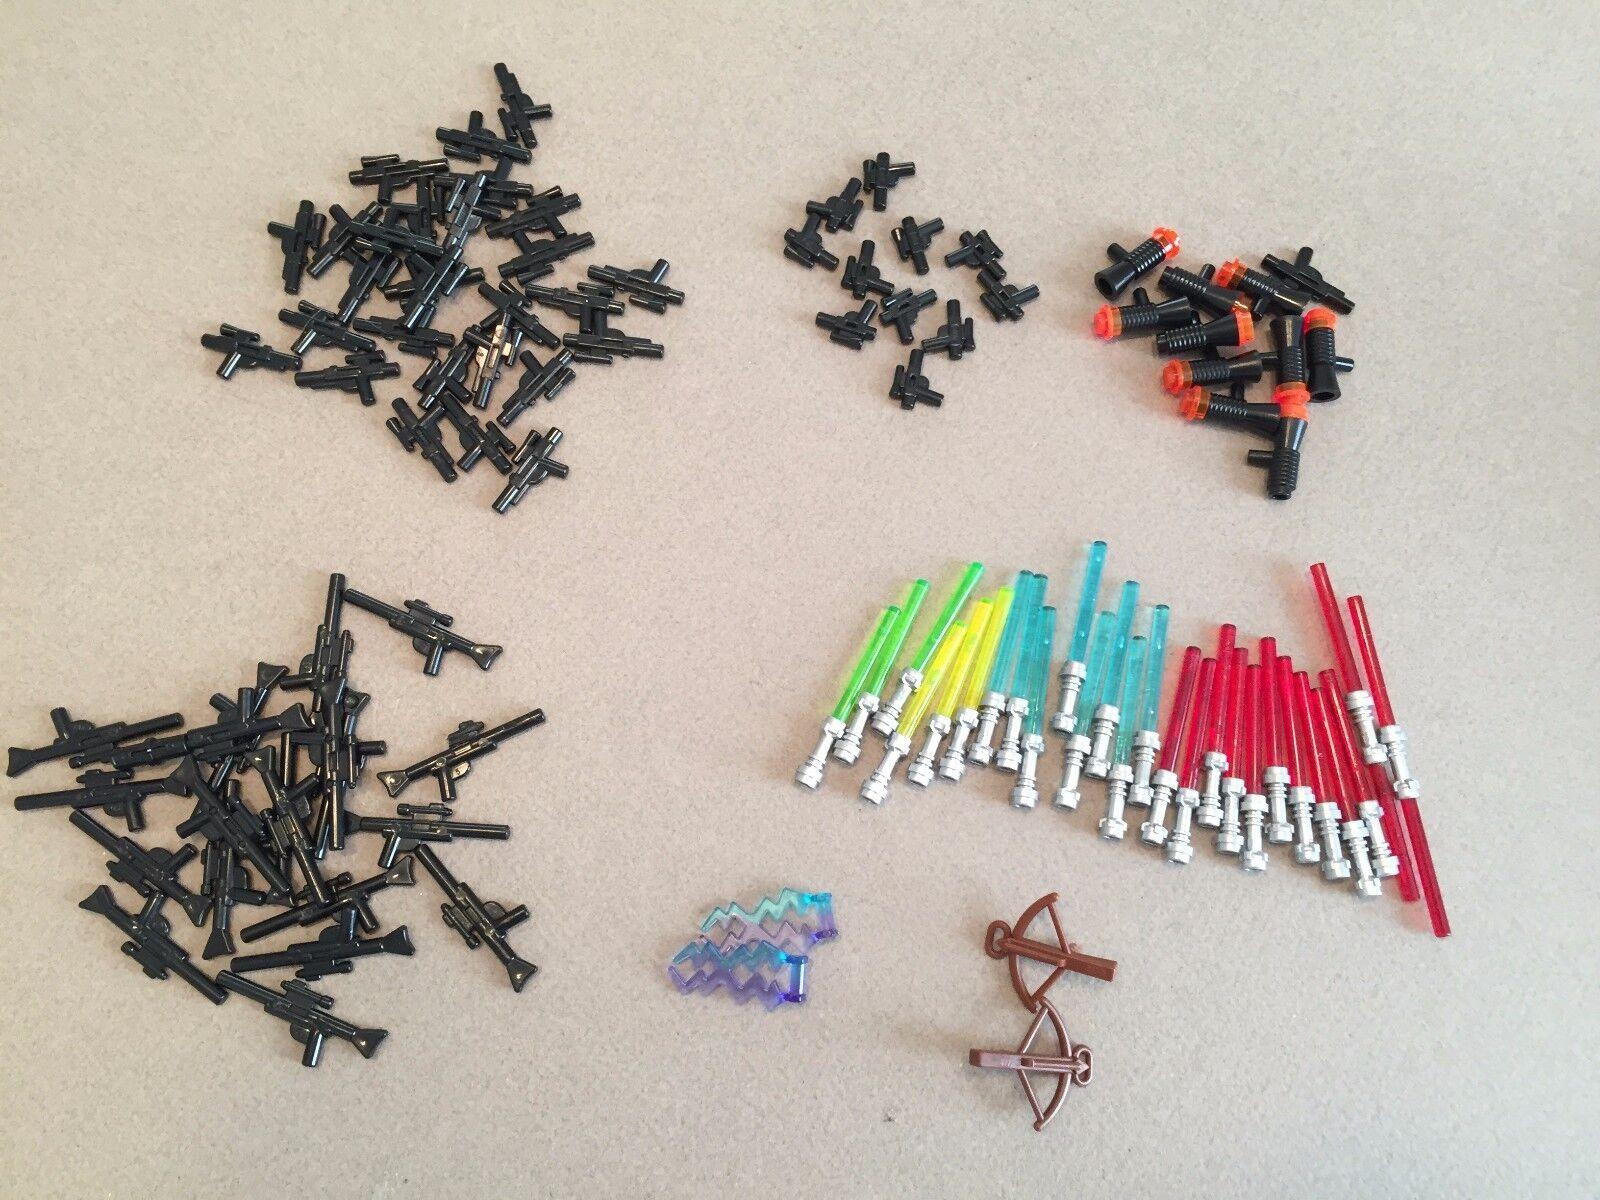 Huge 100 Piece LEGO Star Wars Weapons Lot Lightsabers Blasters Rifles Pistols